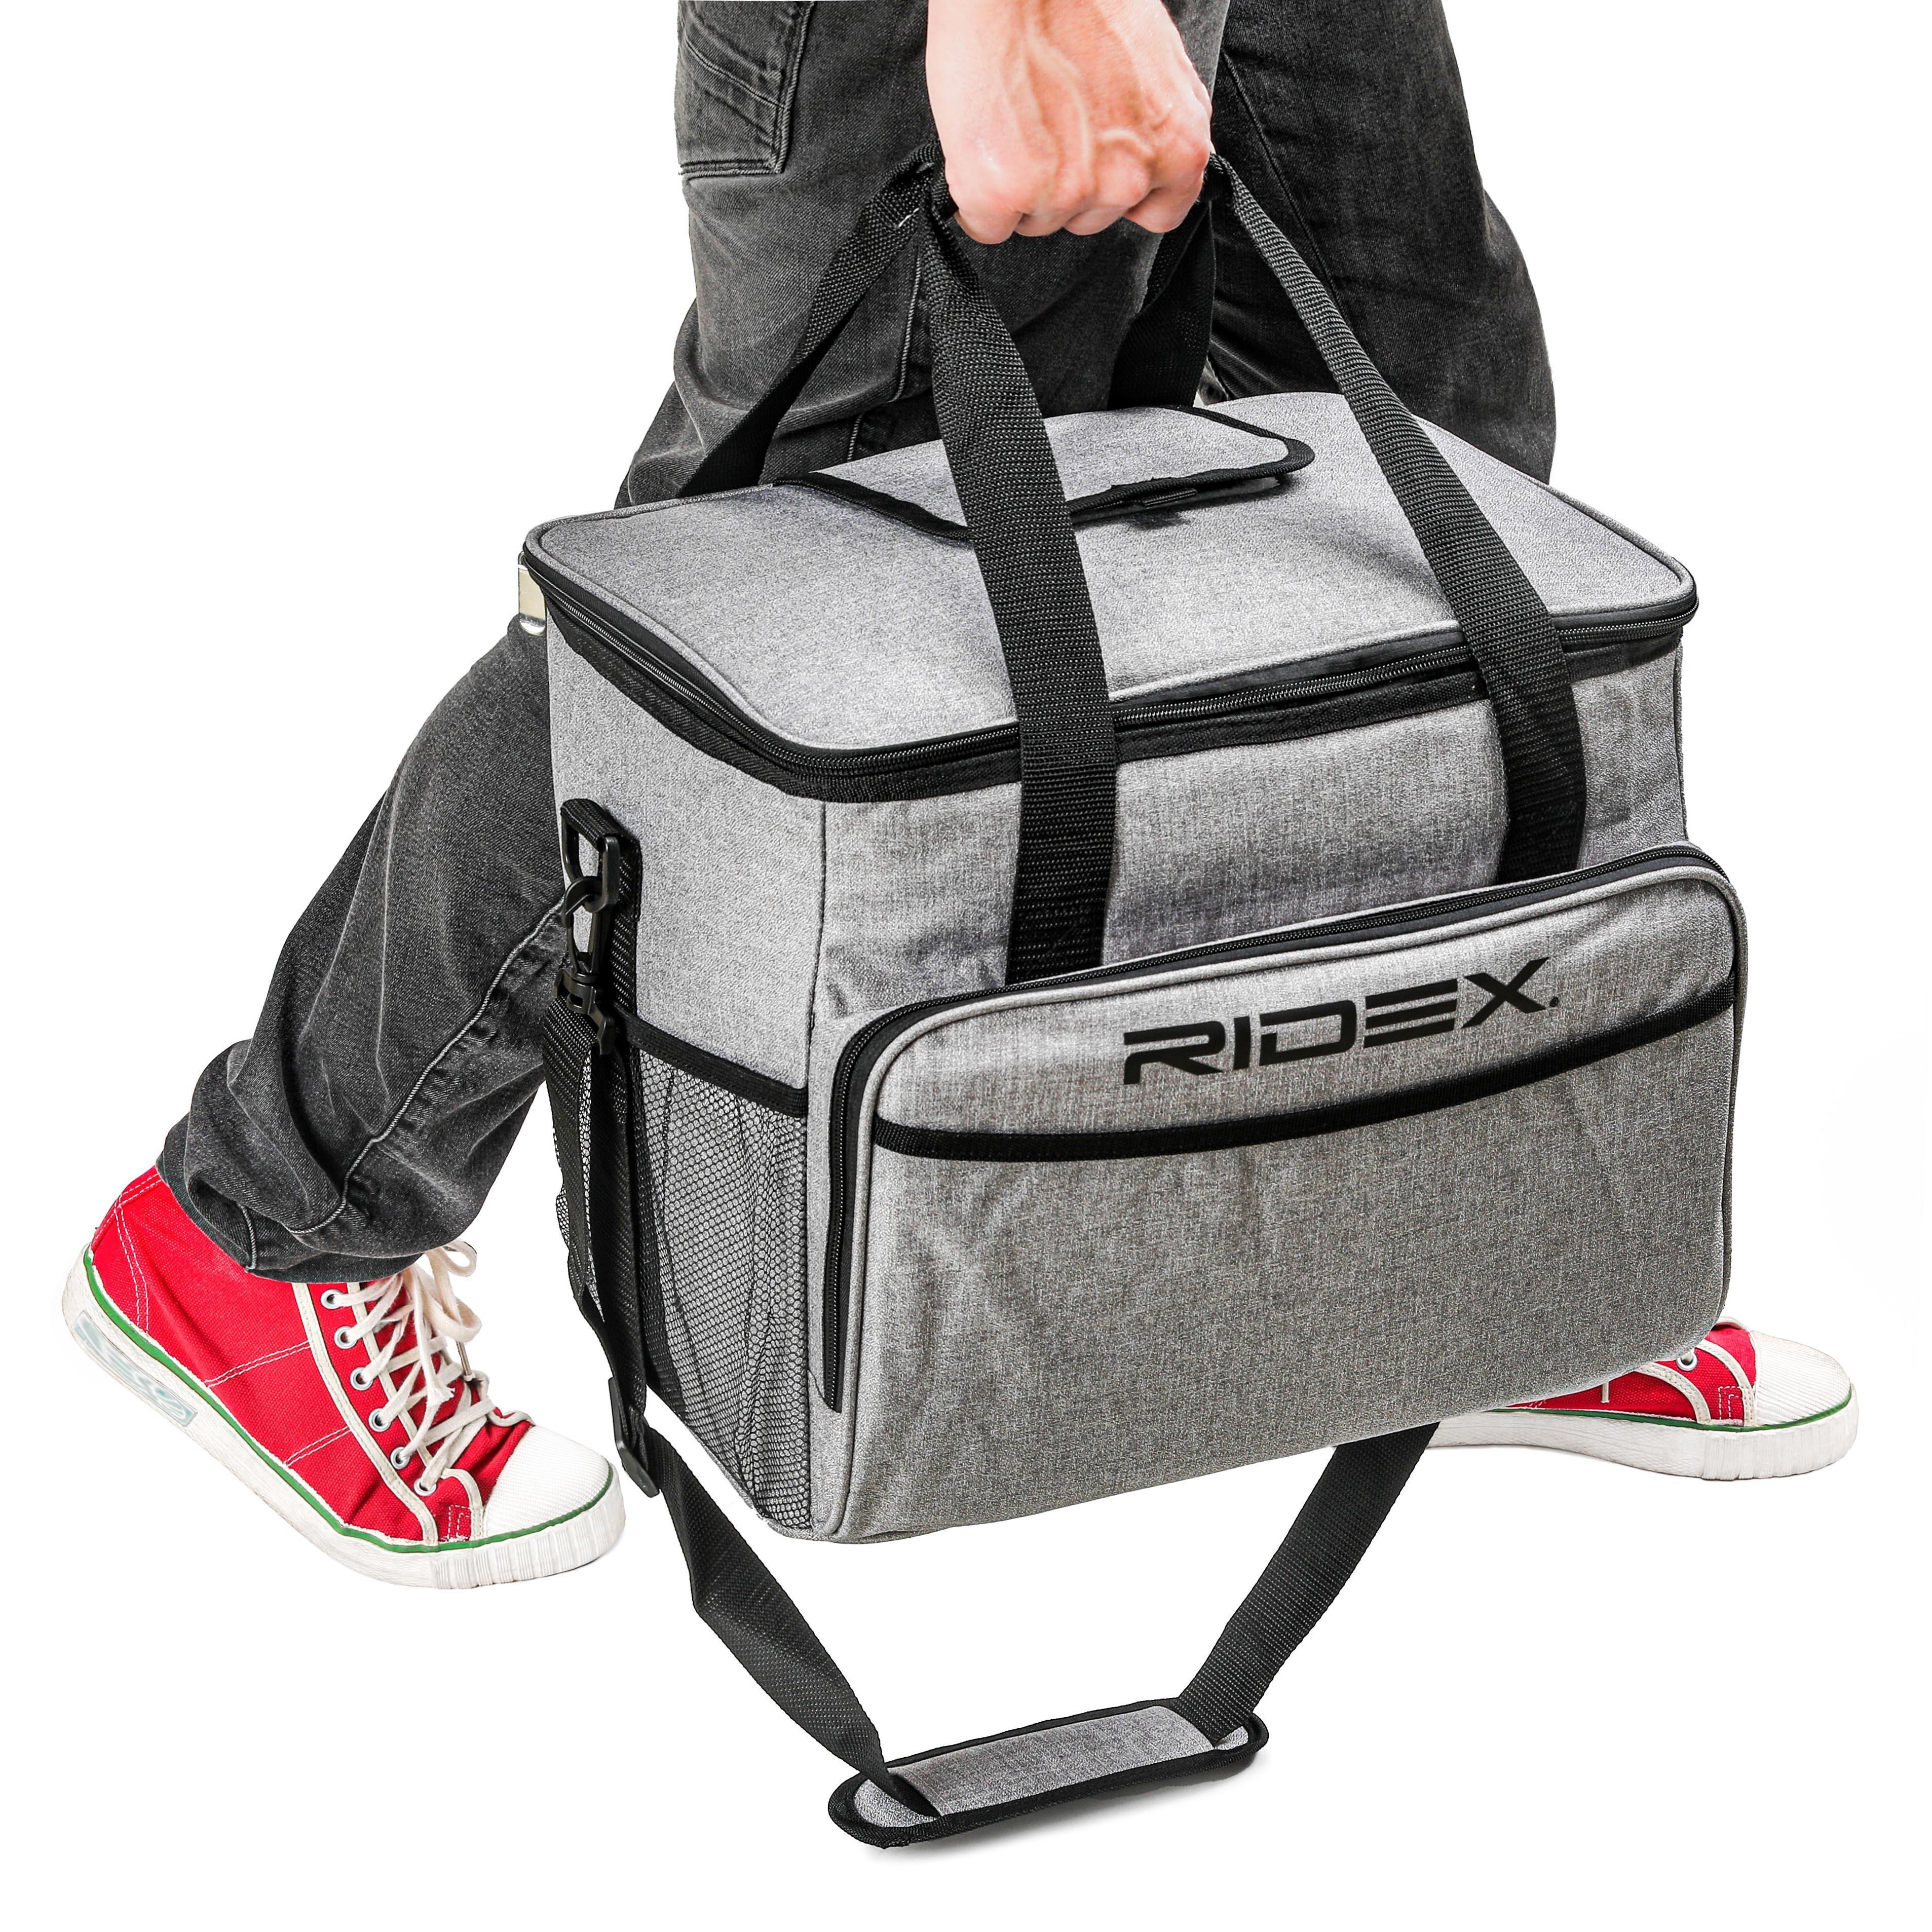 Cooler bag RIDEX 6006A0002 4066016176180